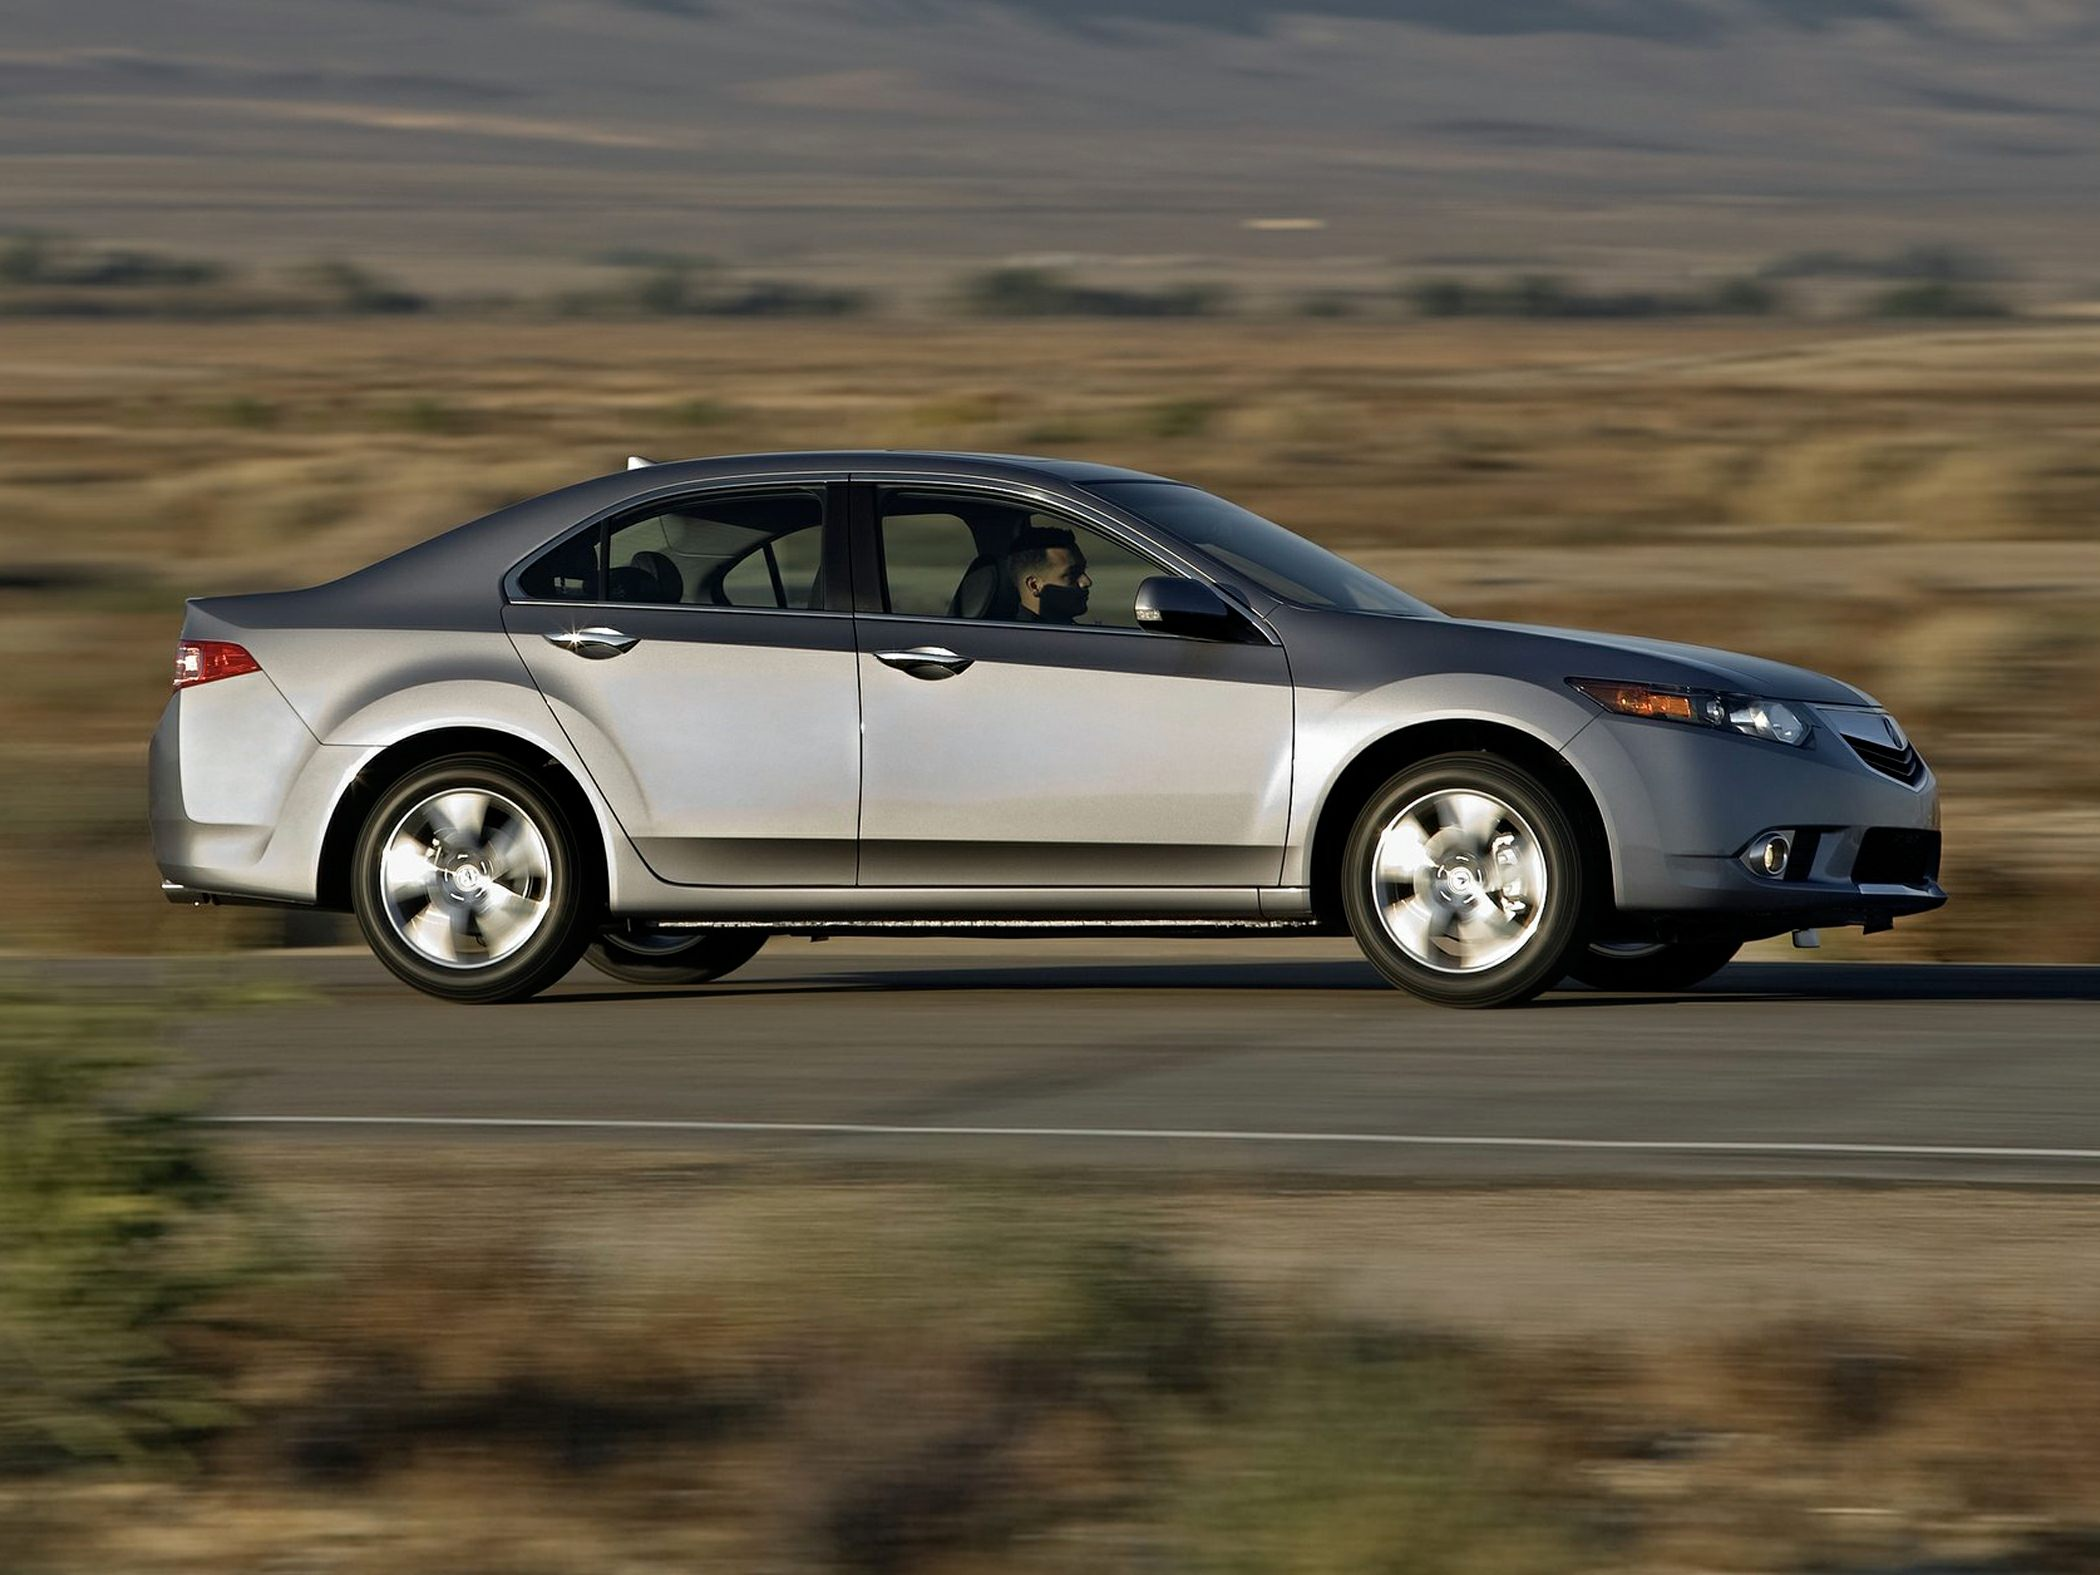 2014 Acura TSX Glam2